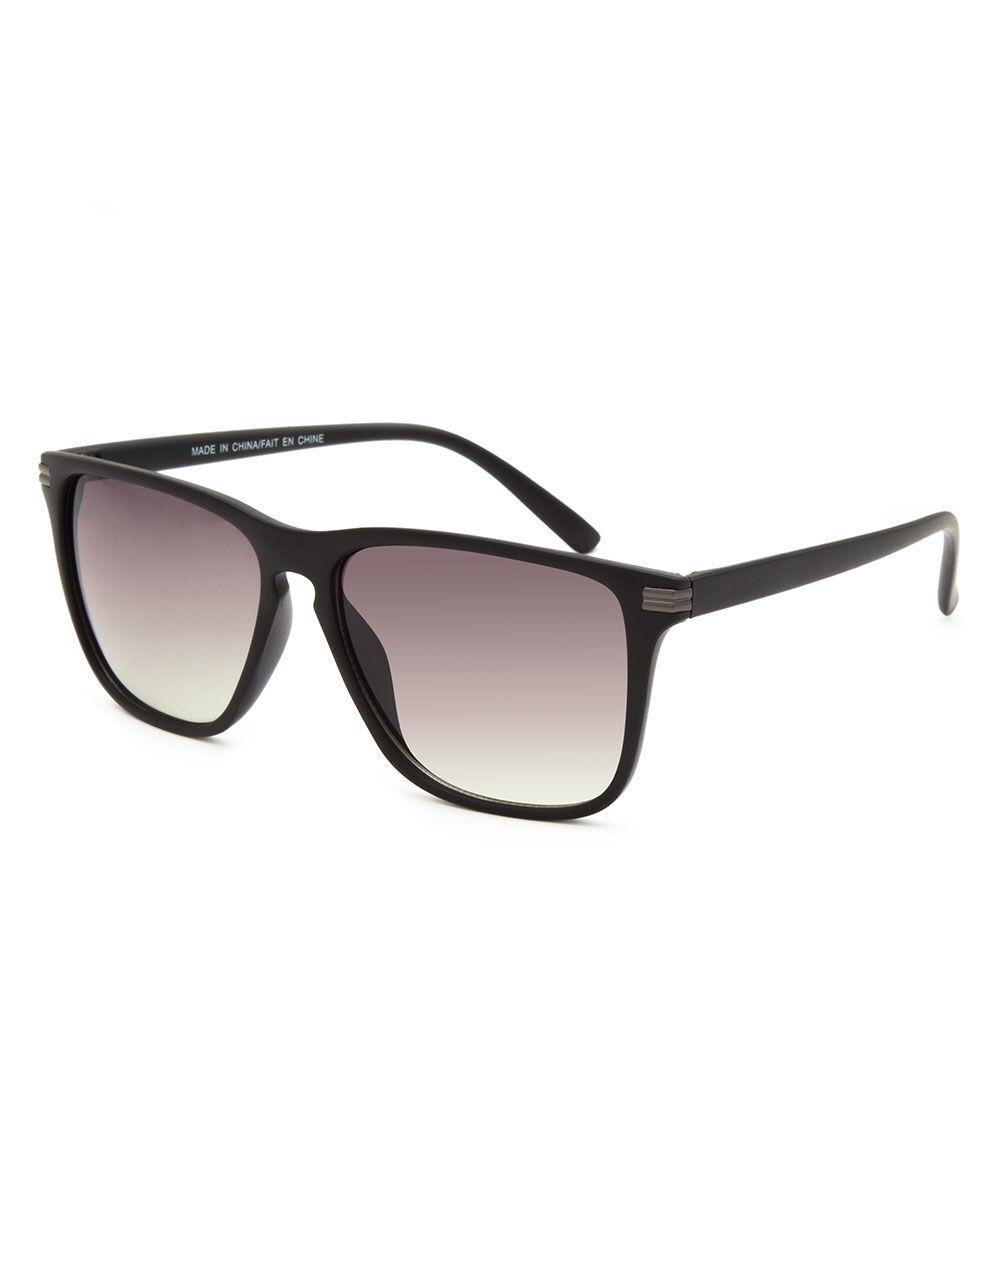 BLUE CROWN Keyhole Sunglasses